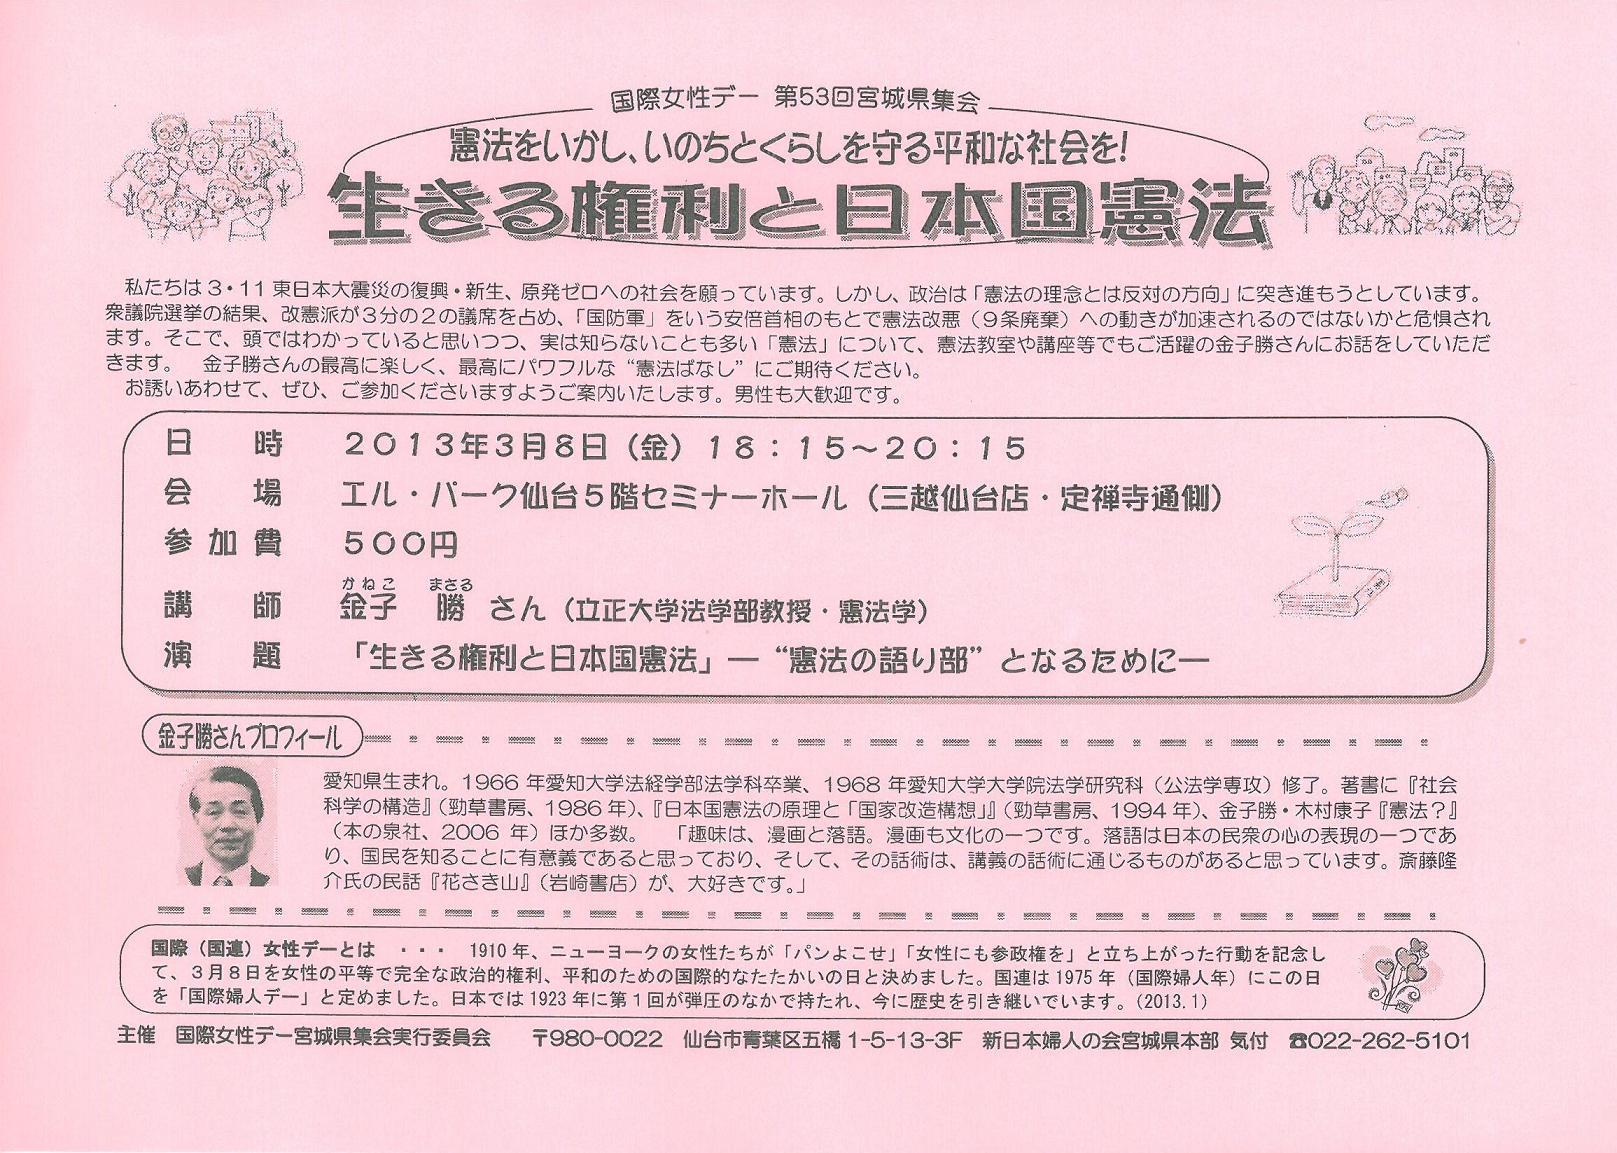 SKMBT_C22013022209580.jpg